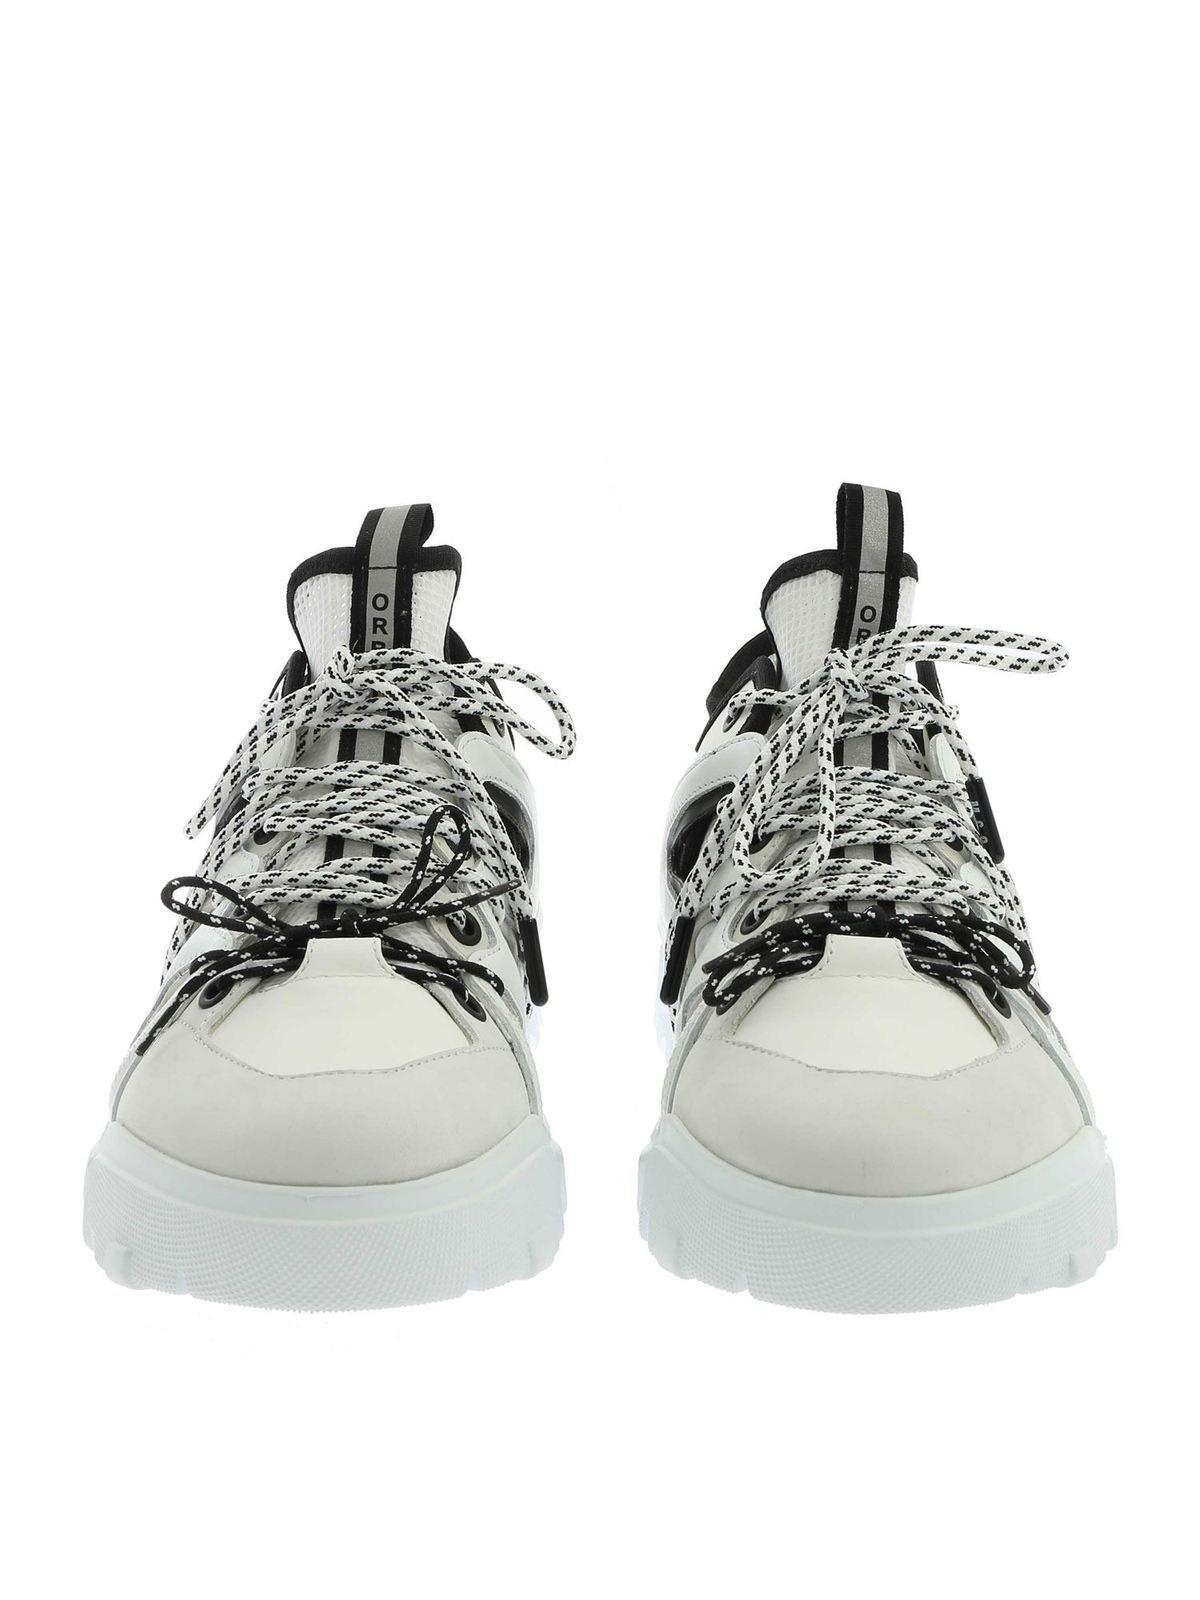 alexander mcqueen white trainers